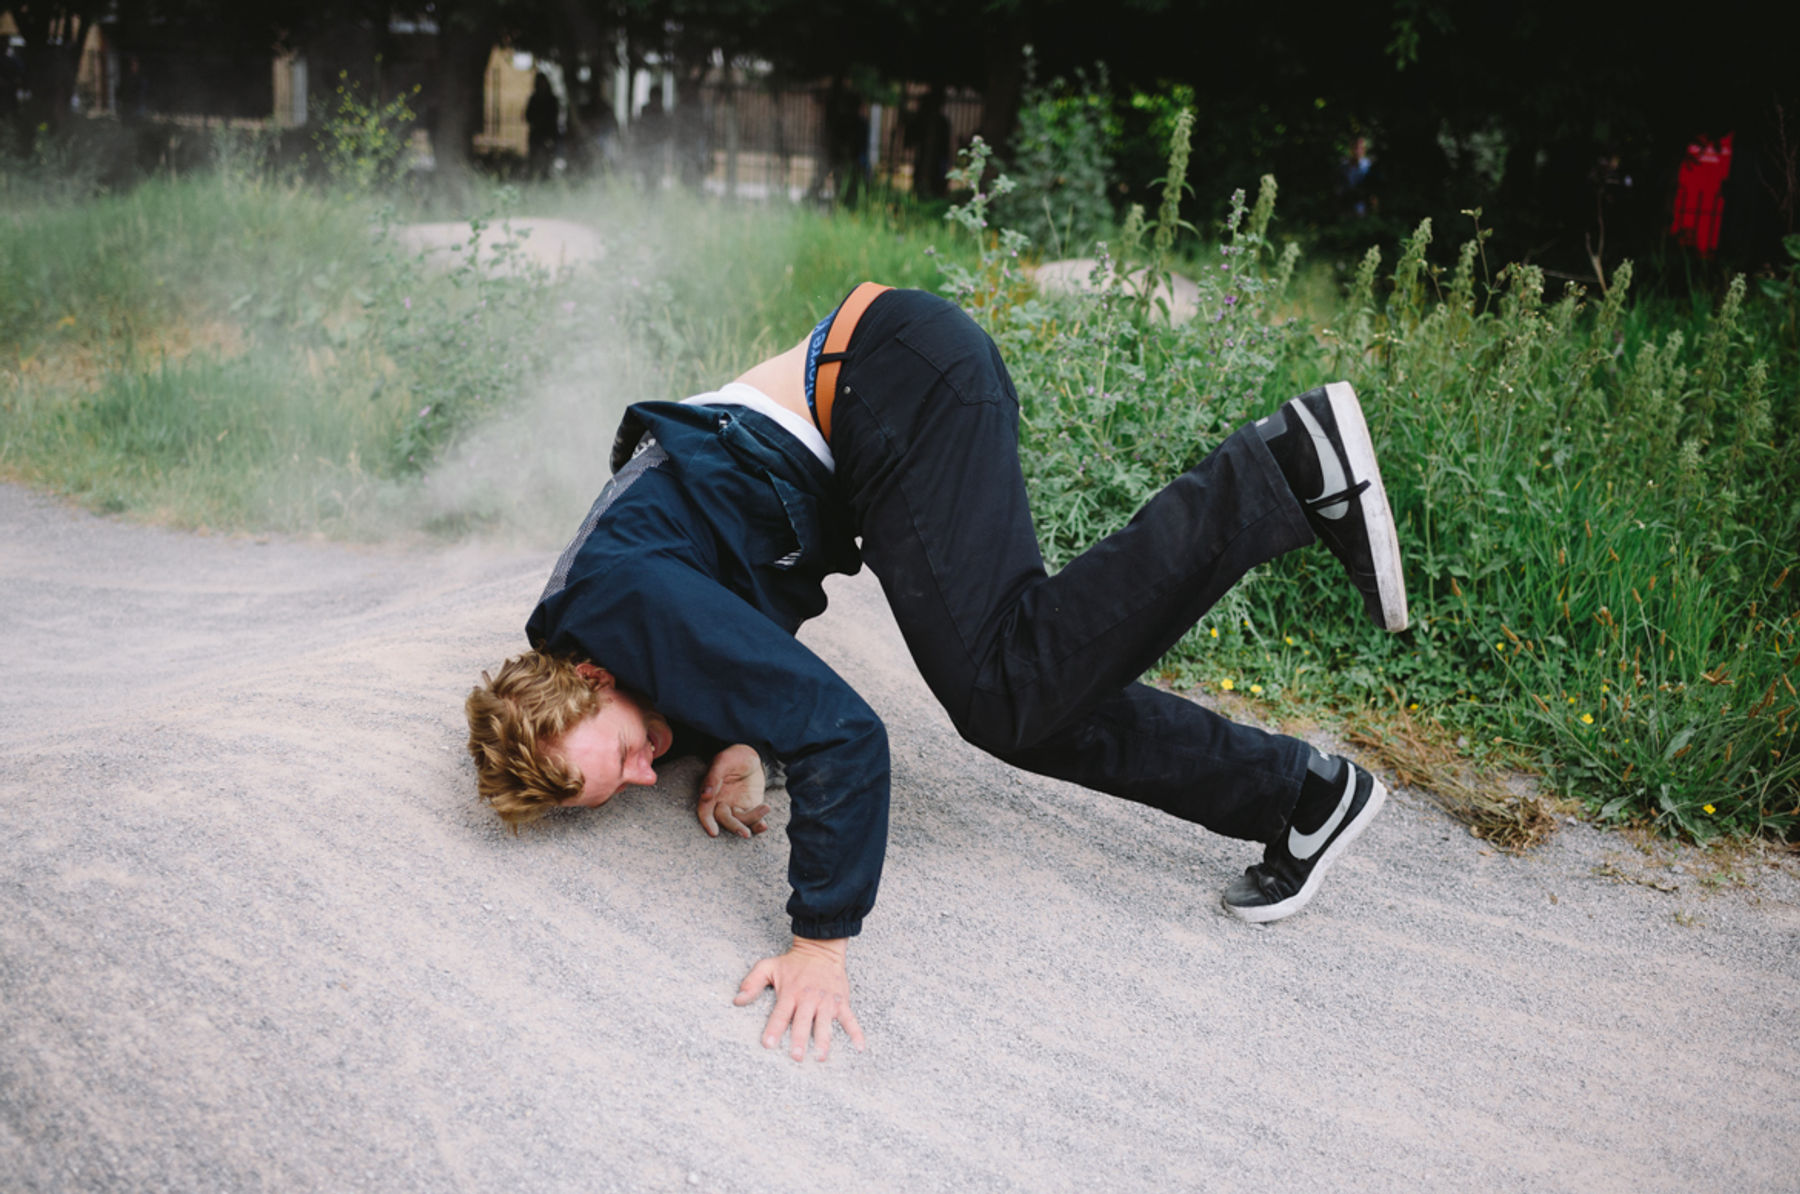 _IHC7821e-John-Fitzgerald-Nike-SB-x-Slam-City-Skates-Go-Skateboarding-Day-London-June-2015-Photographer-Maksim-Kalanep